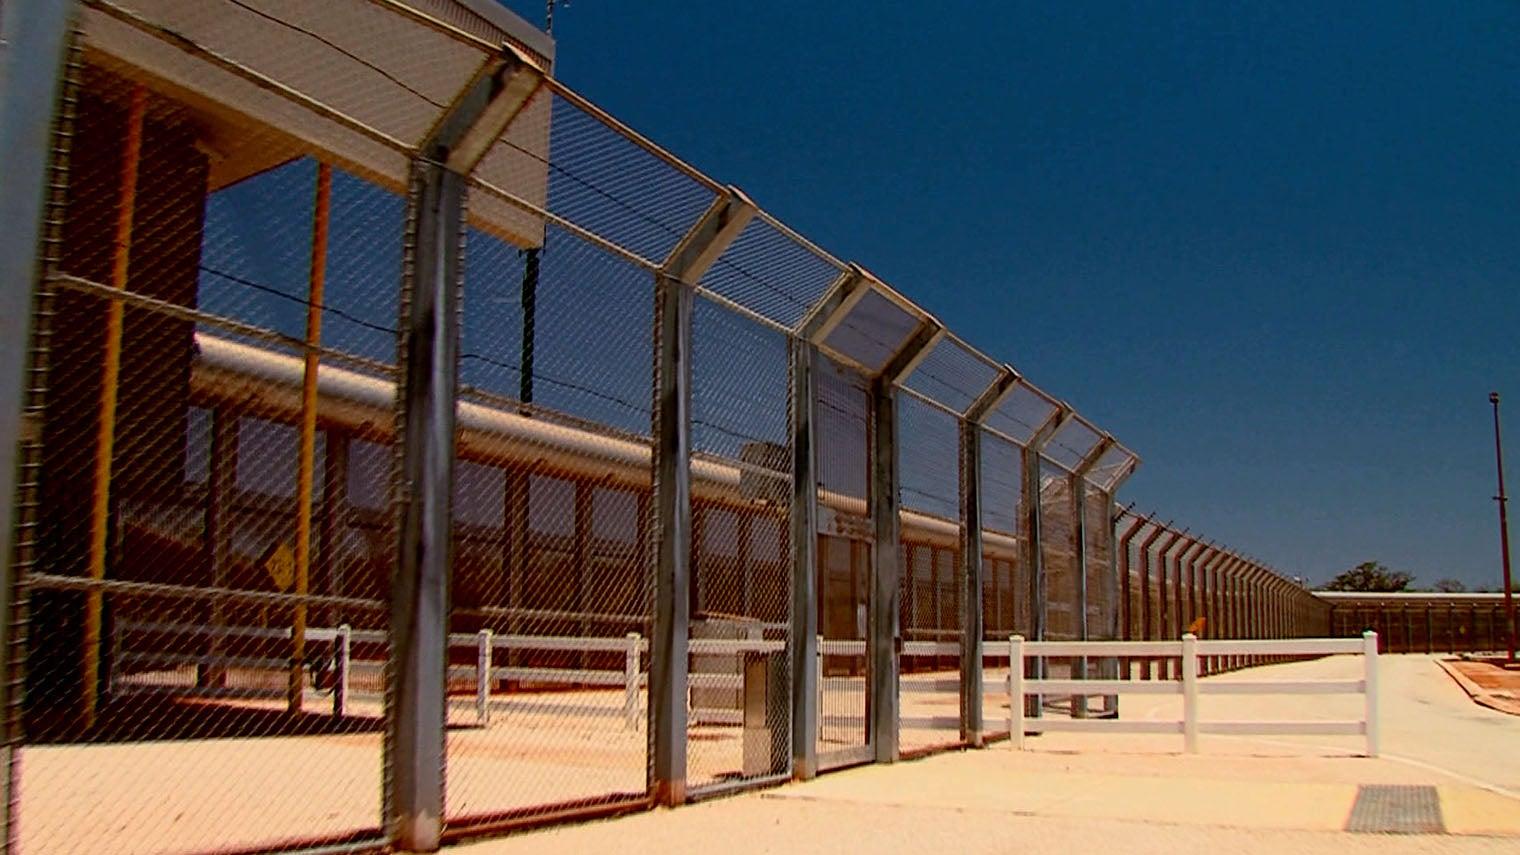 photo of a jail premises